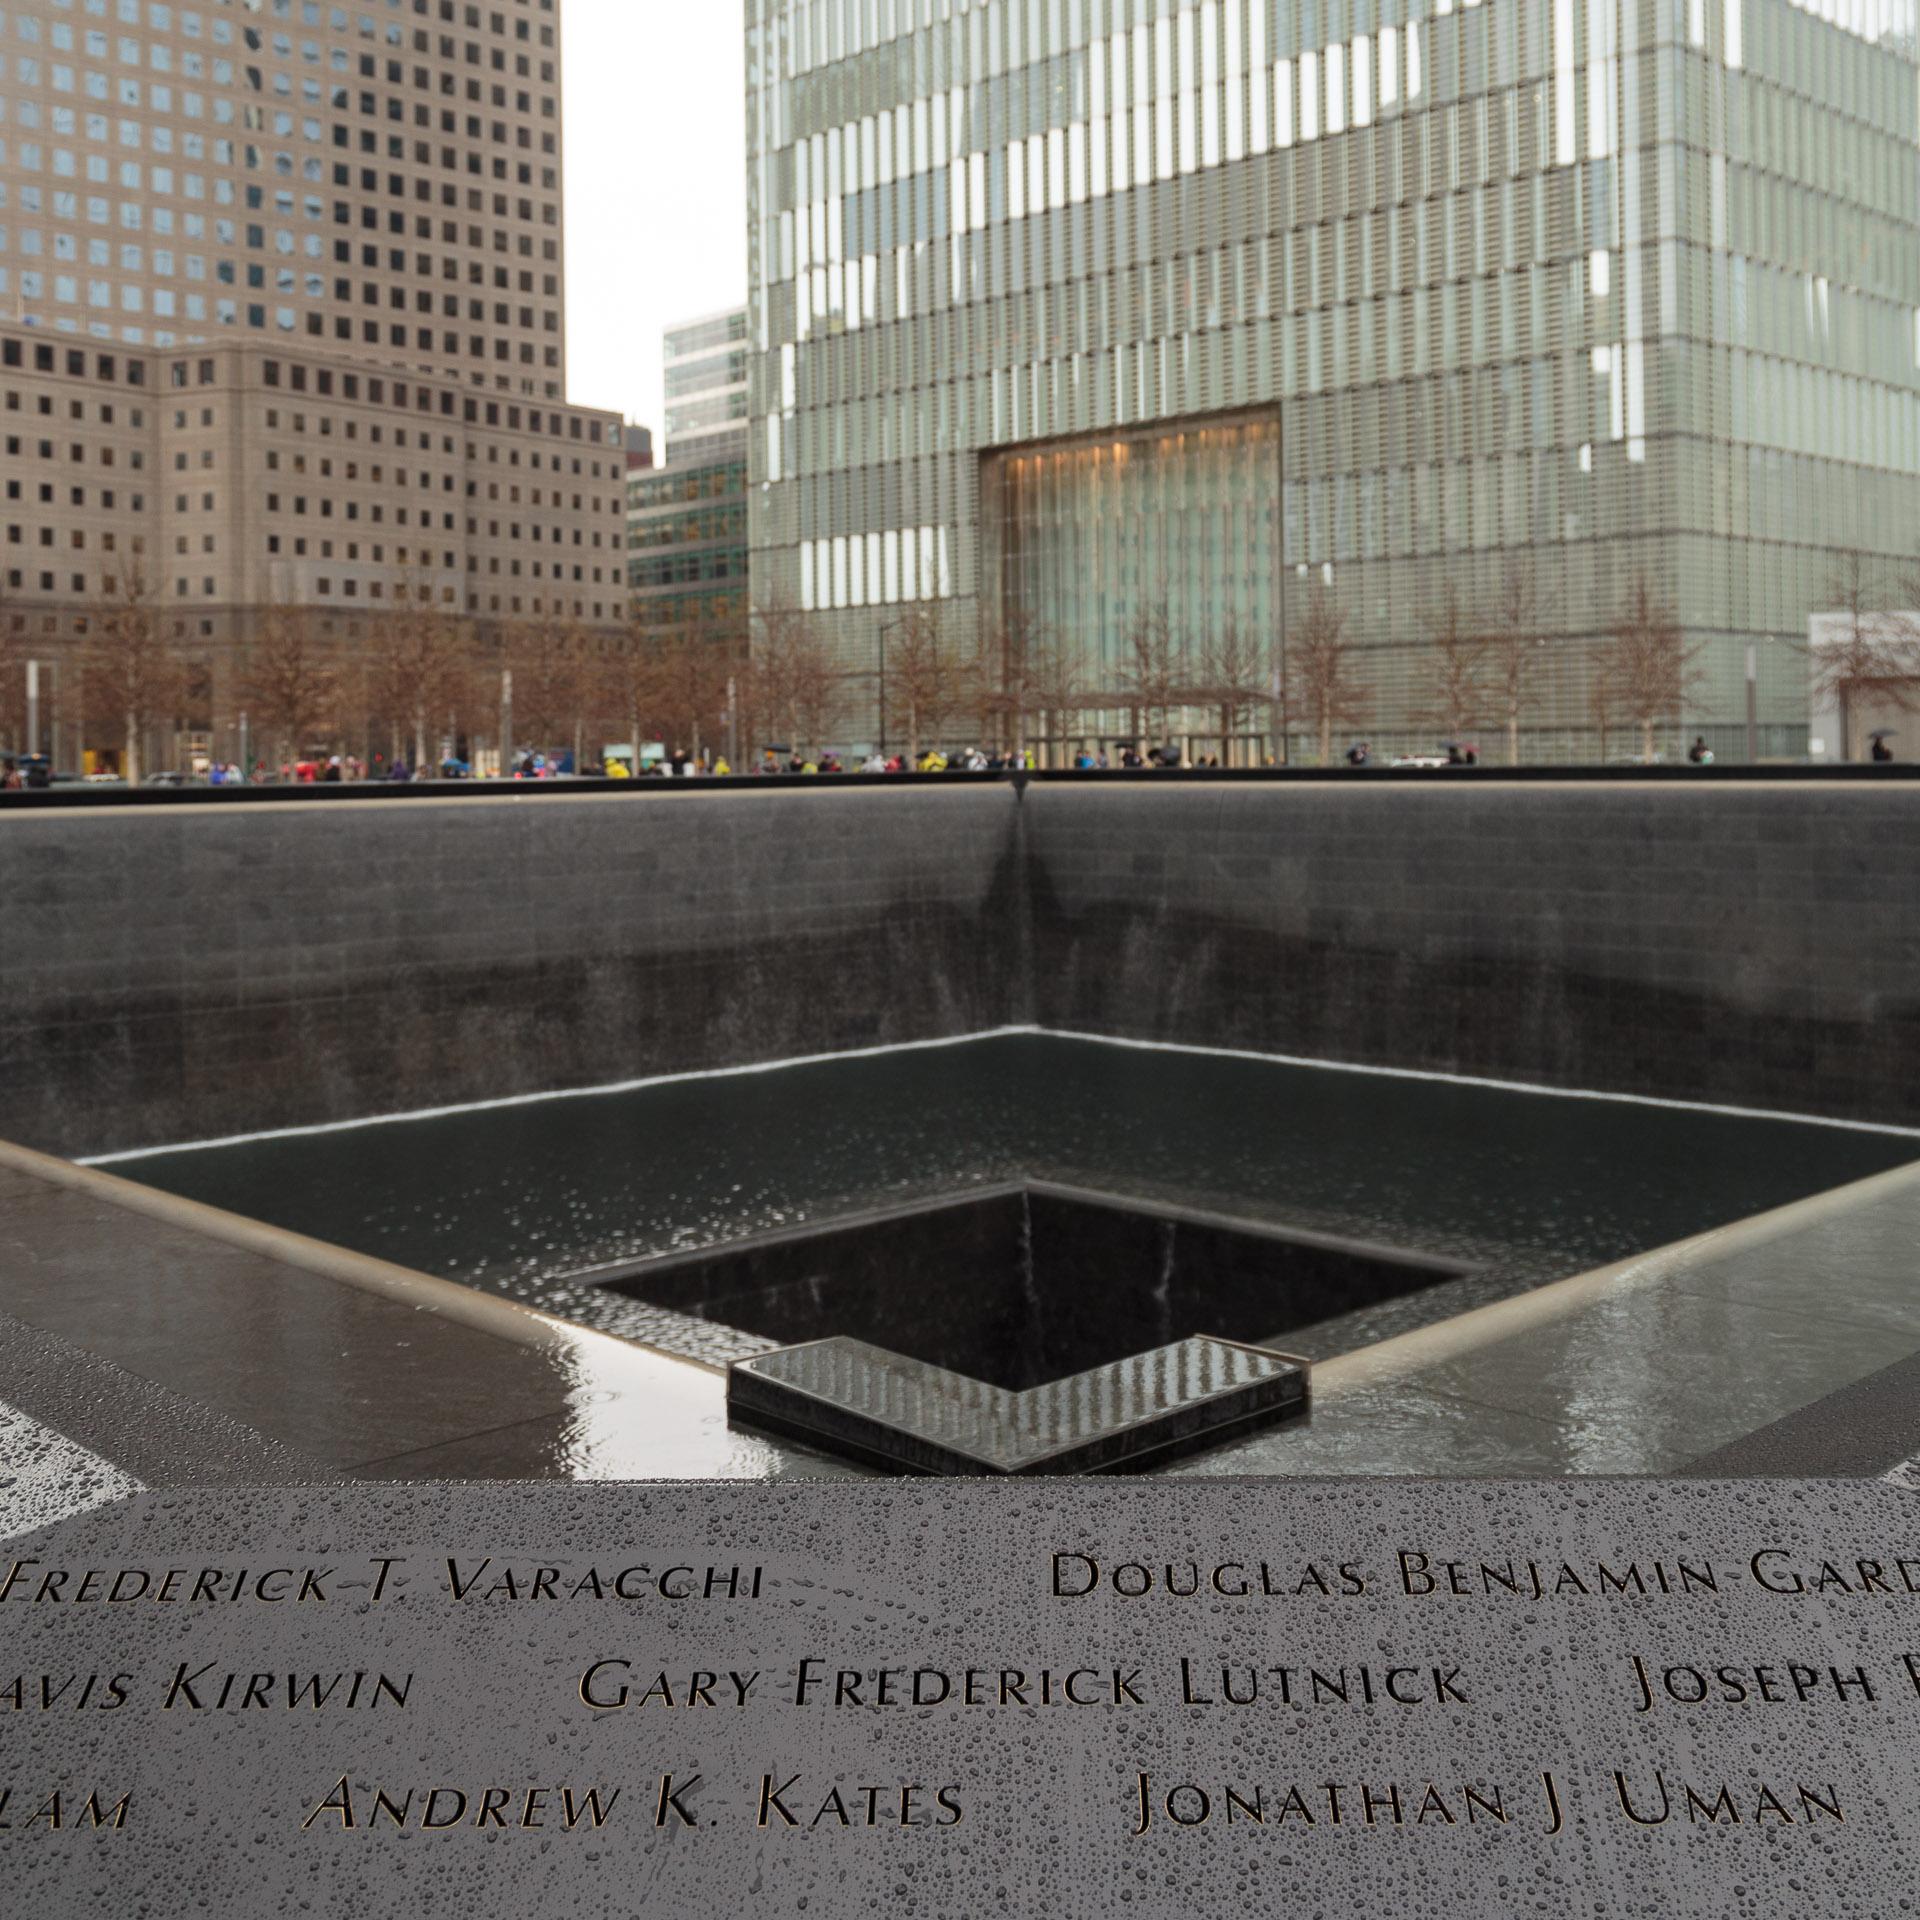 Mahnmal zu 9/11